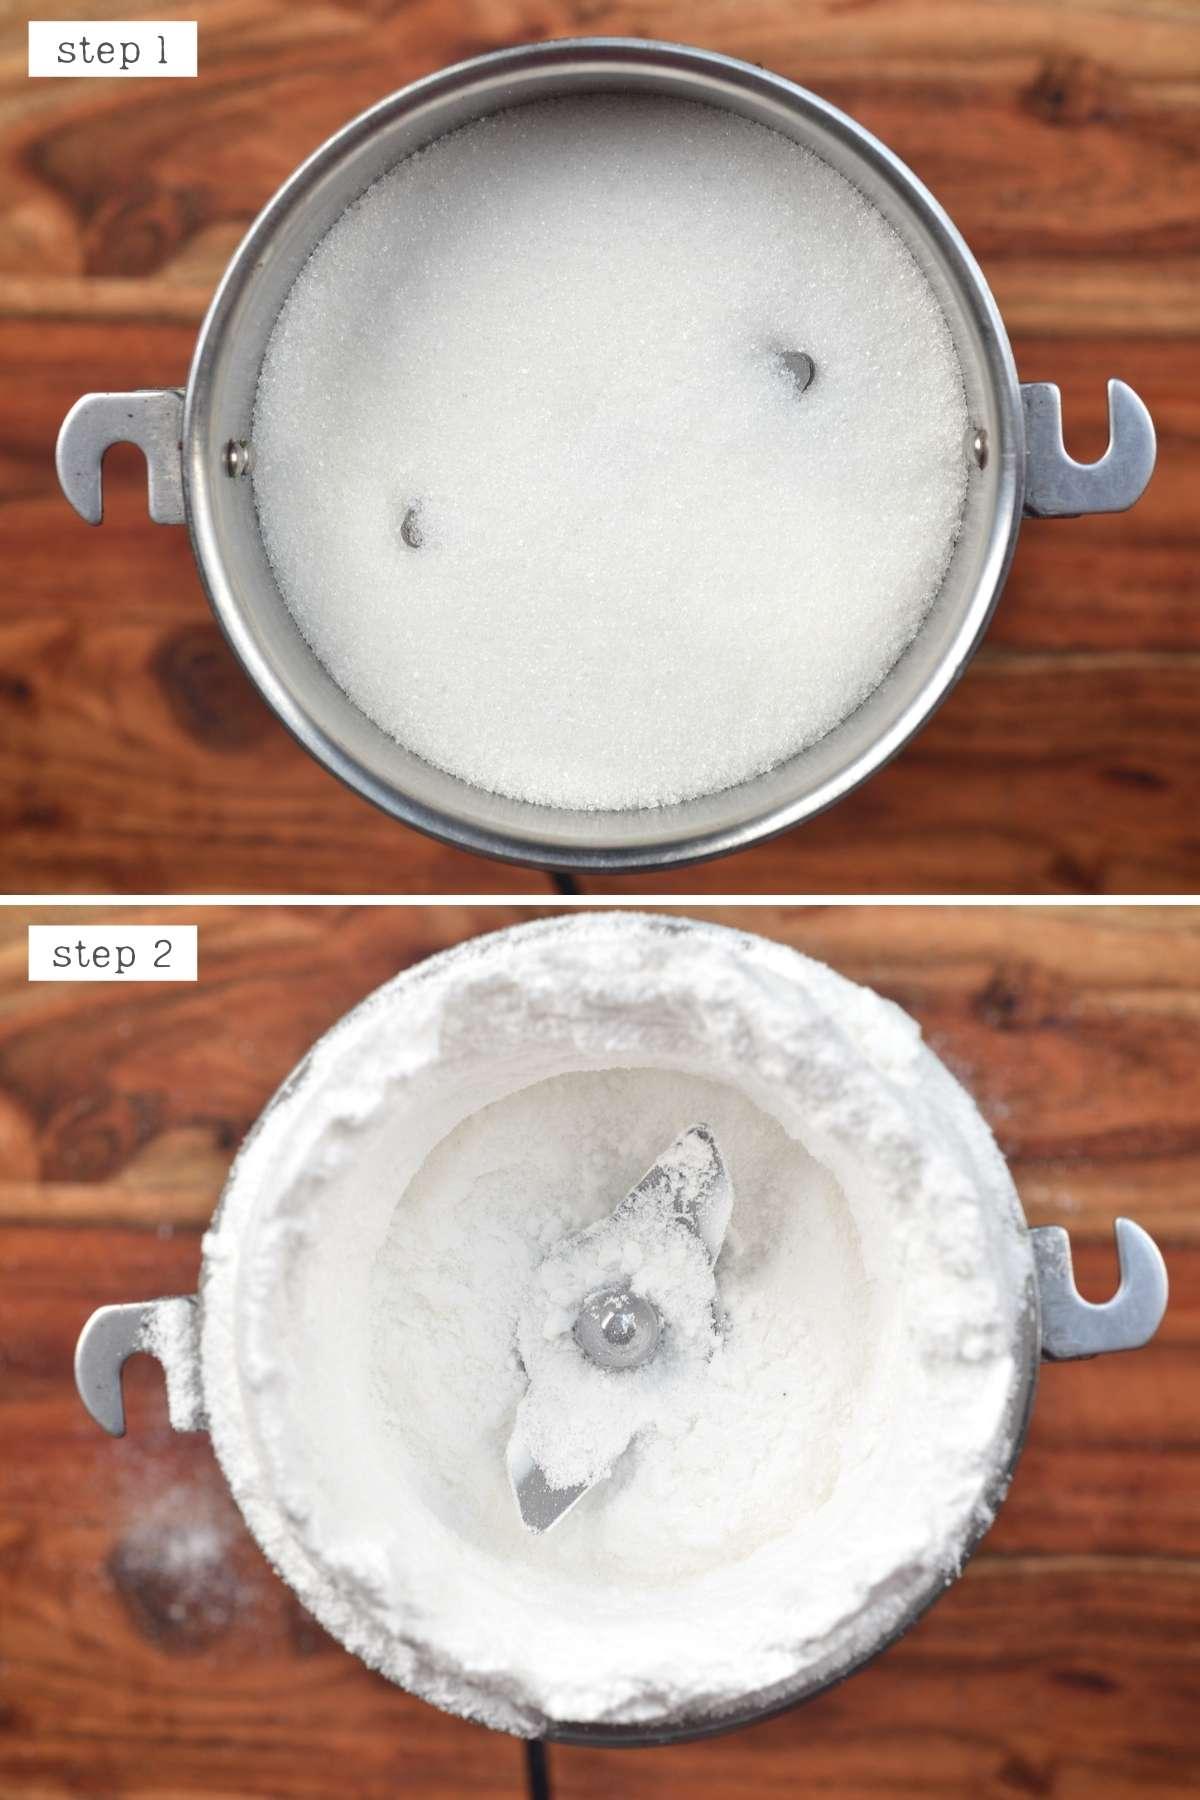 Steps for making powdered sugar